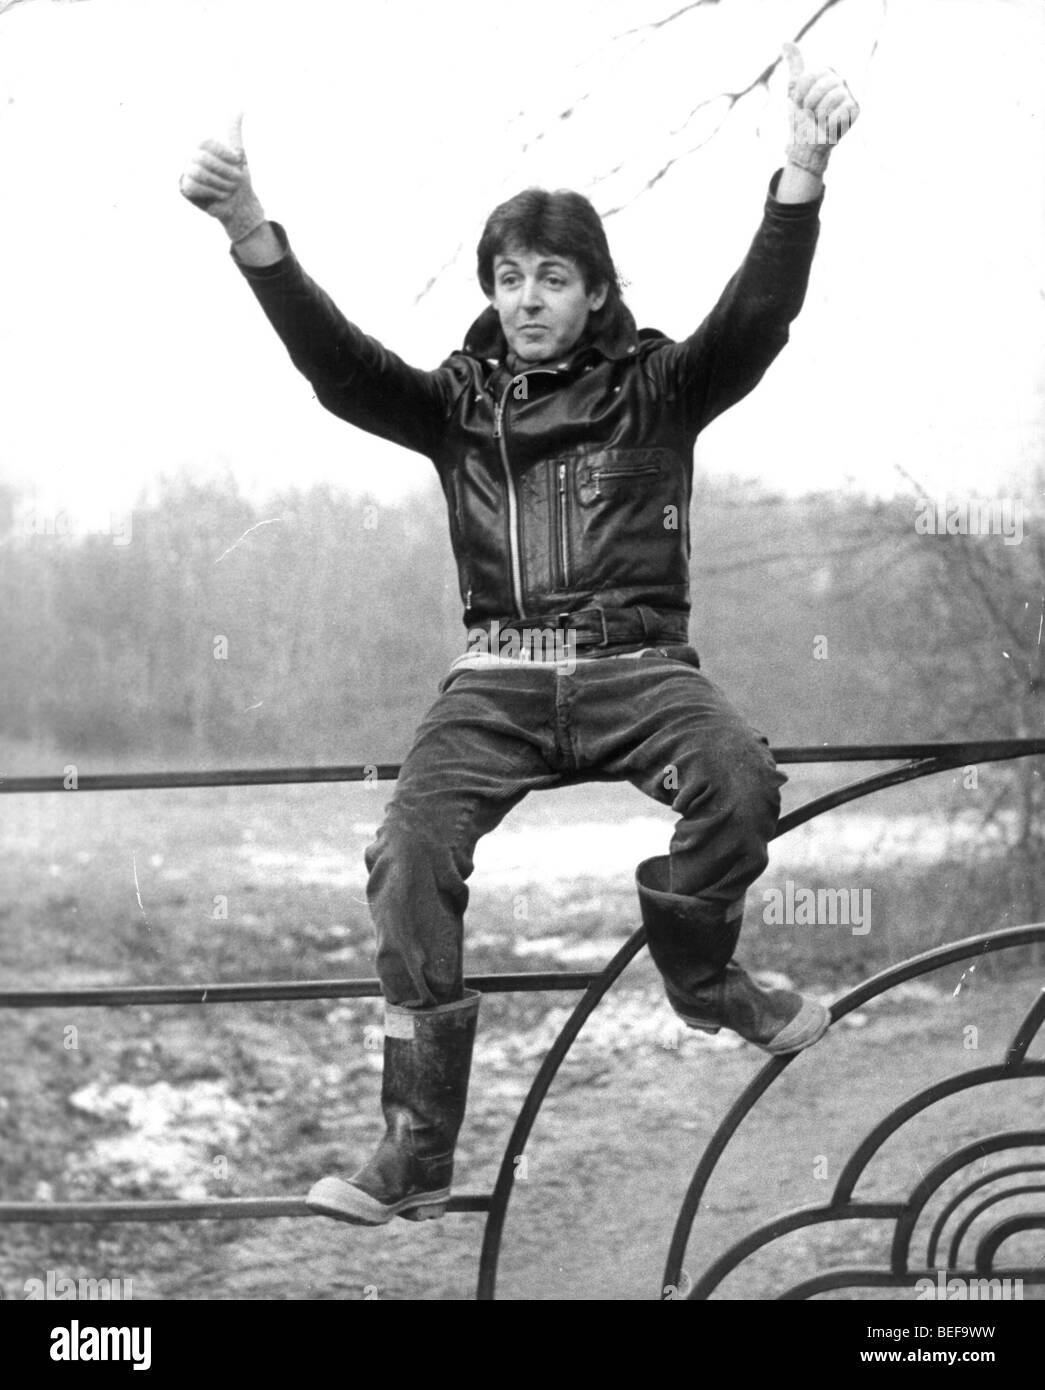 Beatles guitarist PAUL MCCARTNEY, on his farm in Rye, UK. - Stock Image